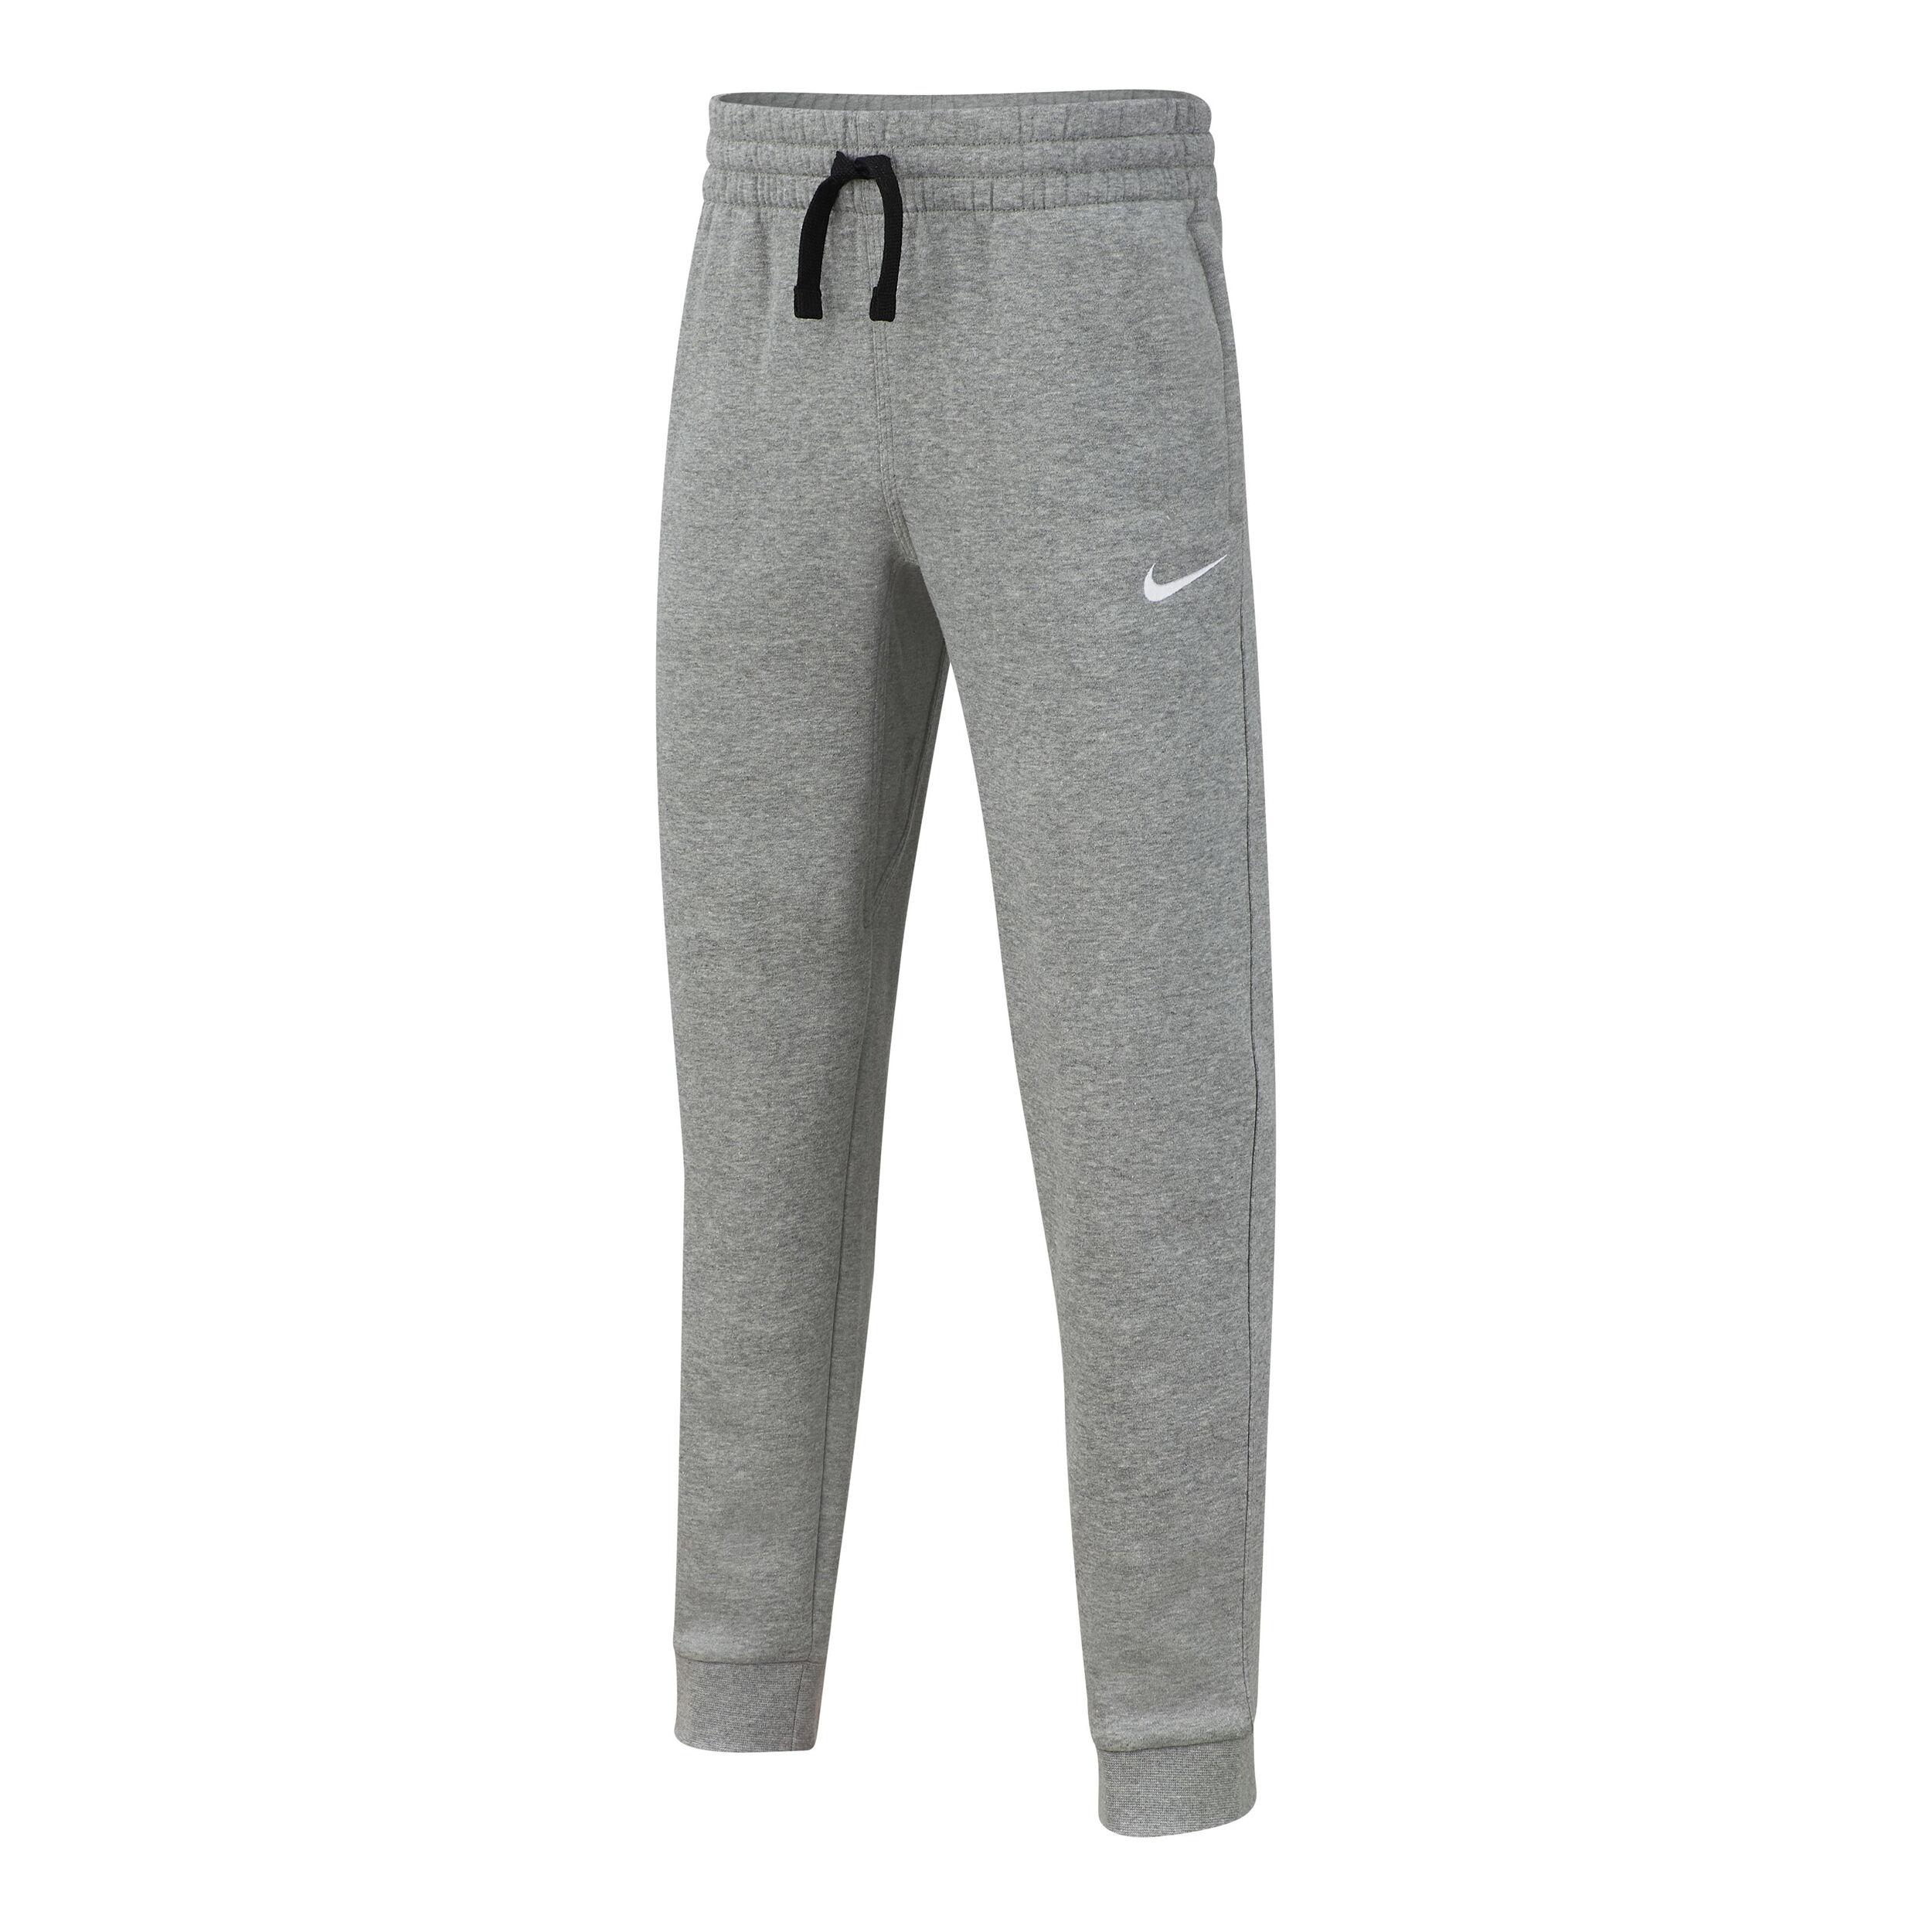 Nike N45 Core BF Training Pants Boys Grey, White